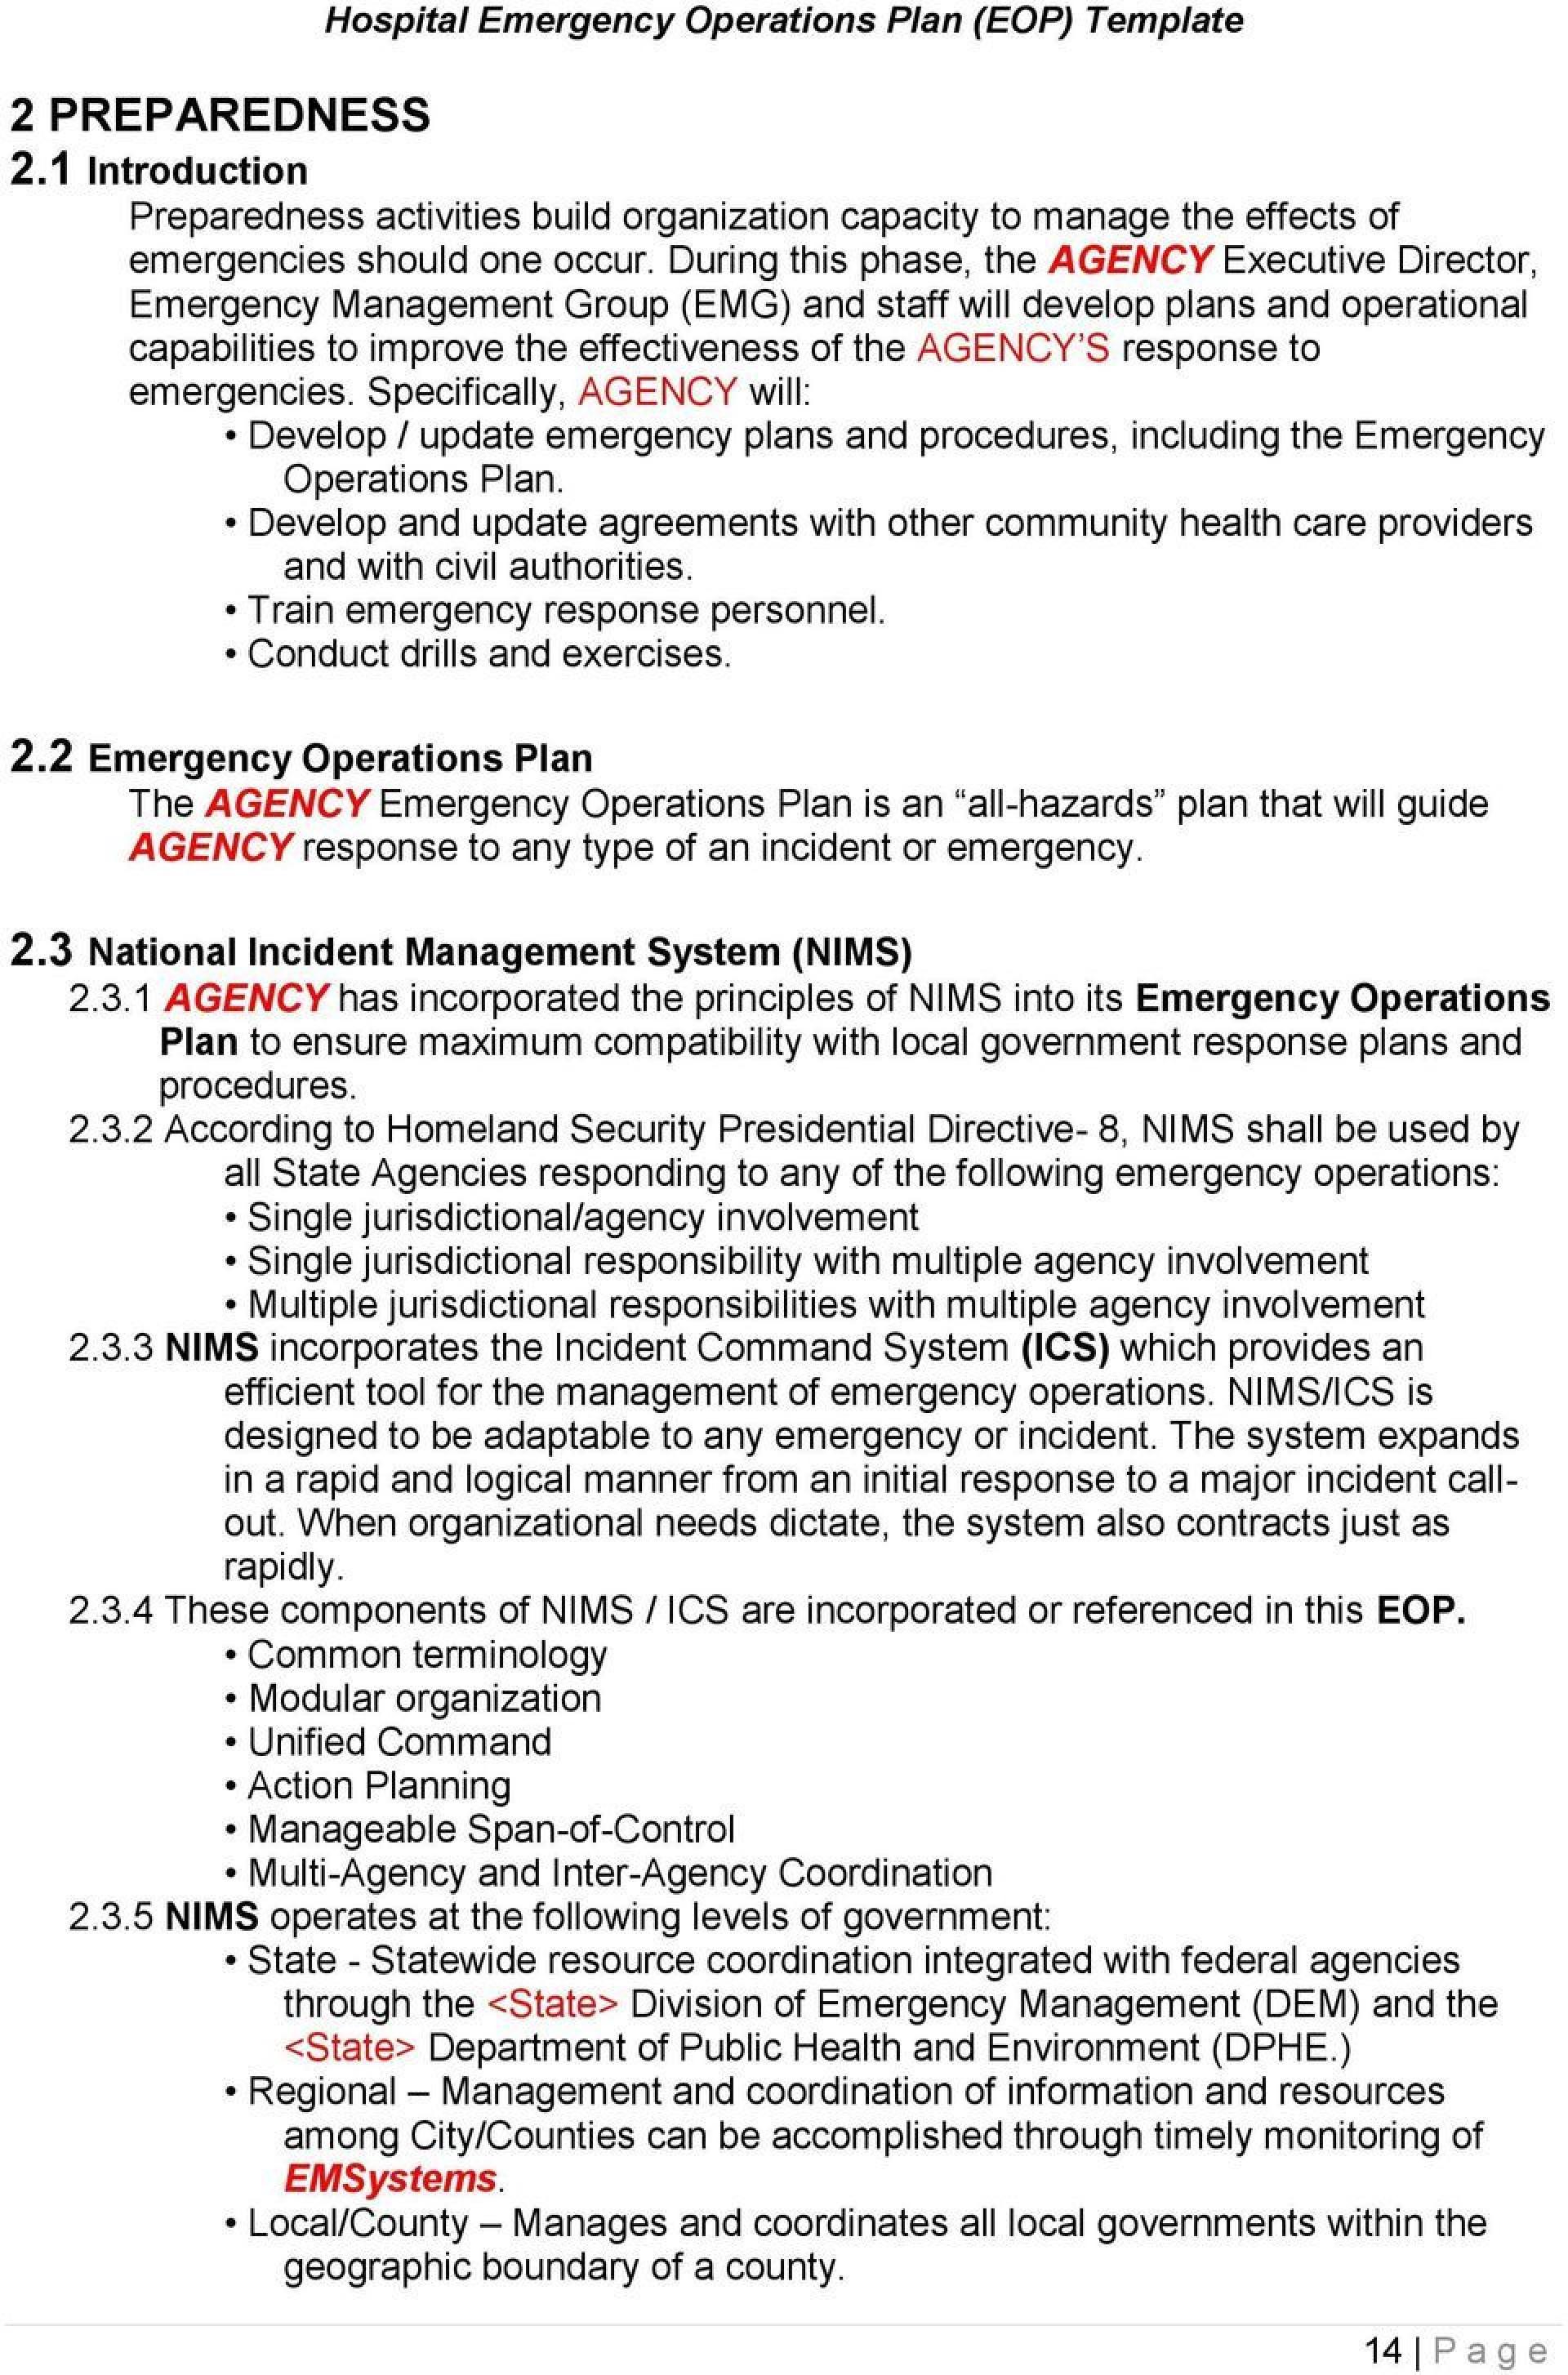 010 Archaicawful Emergency Operation Plan Template High Definition  For Churche Fema Basic1920